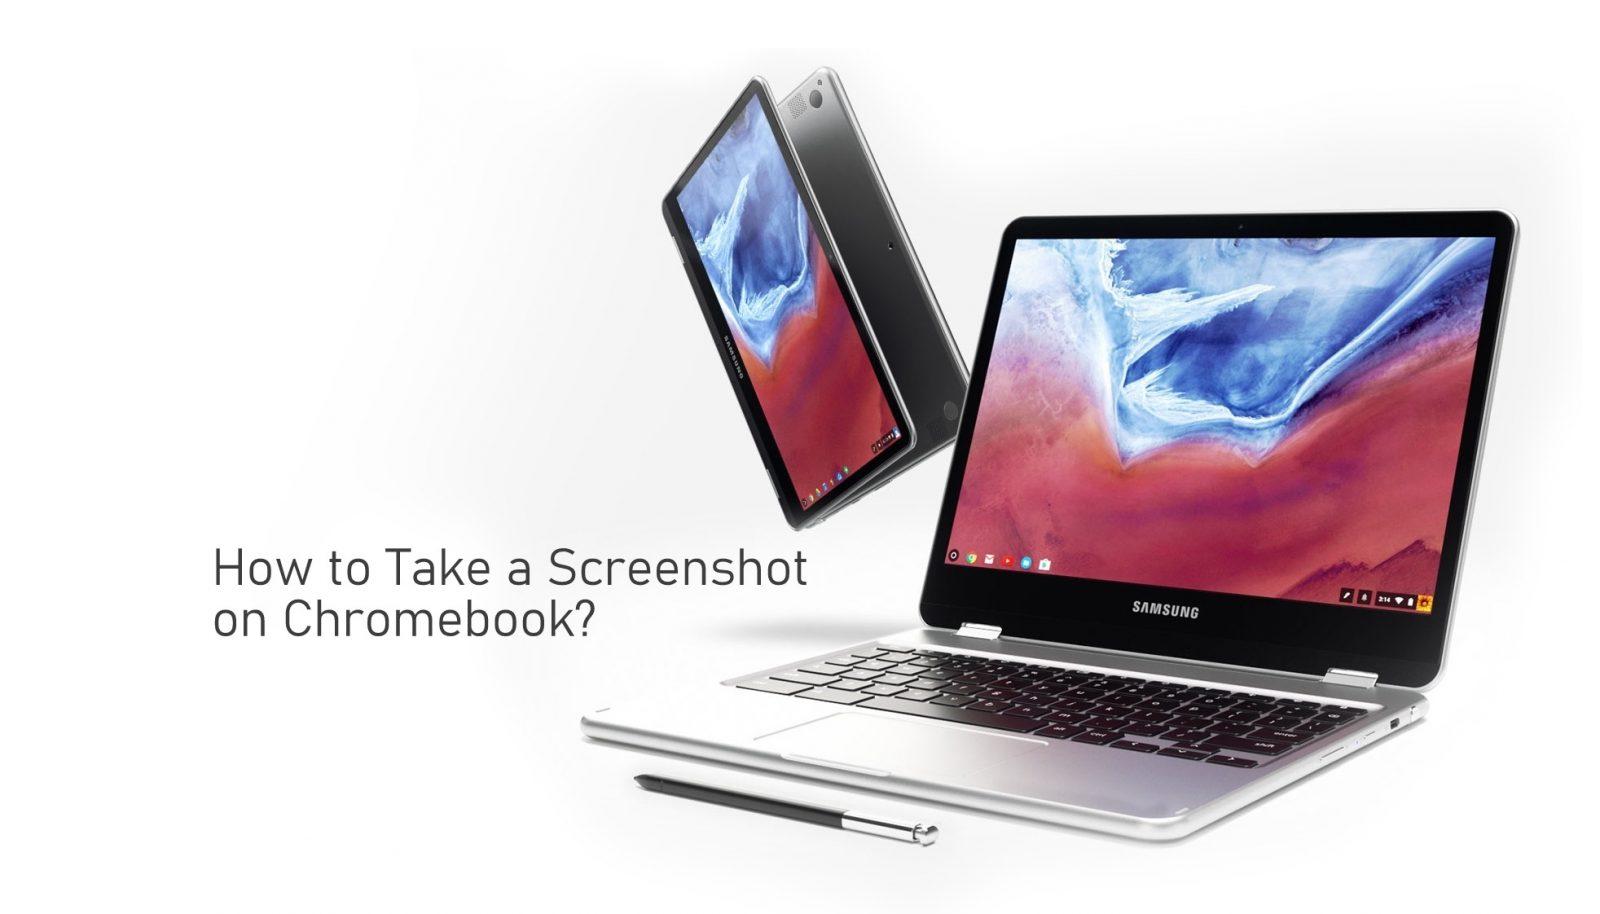 How to Take Screenshot on Chromebook in 3 Ways